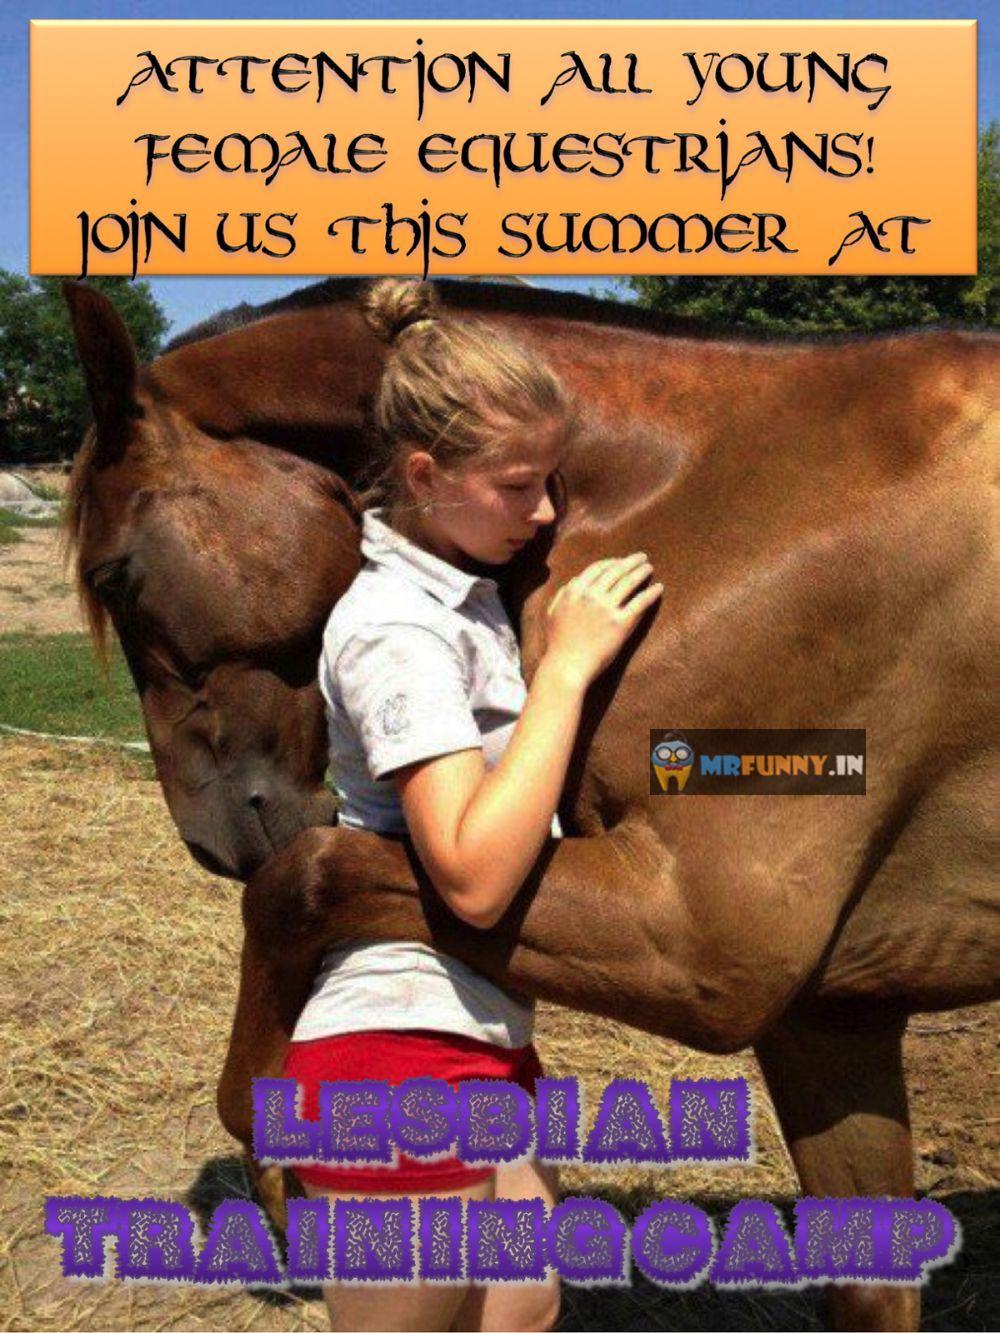 Lesbian training camp for horse loving girls